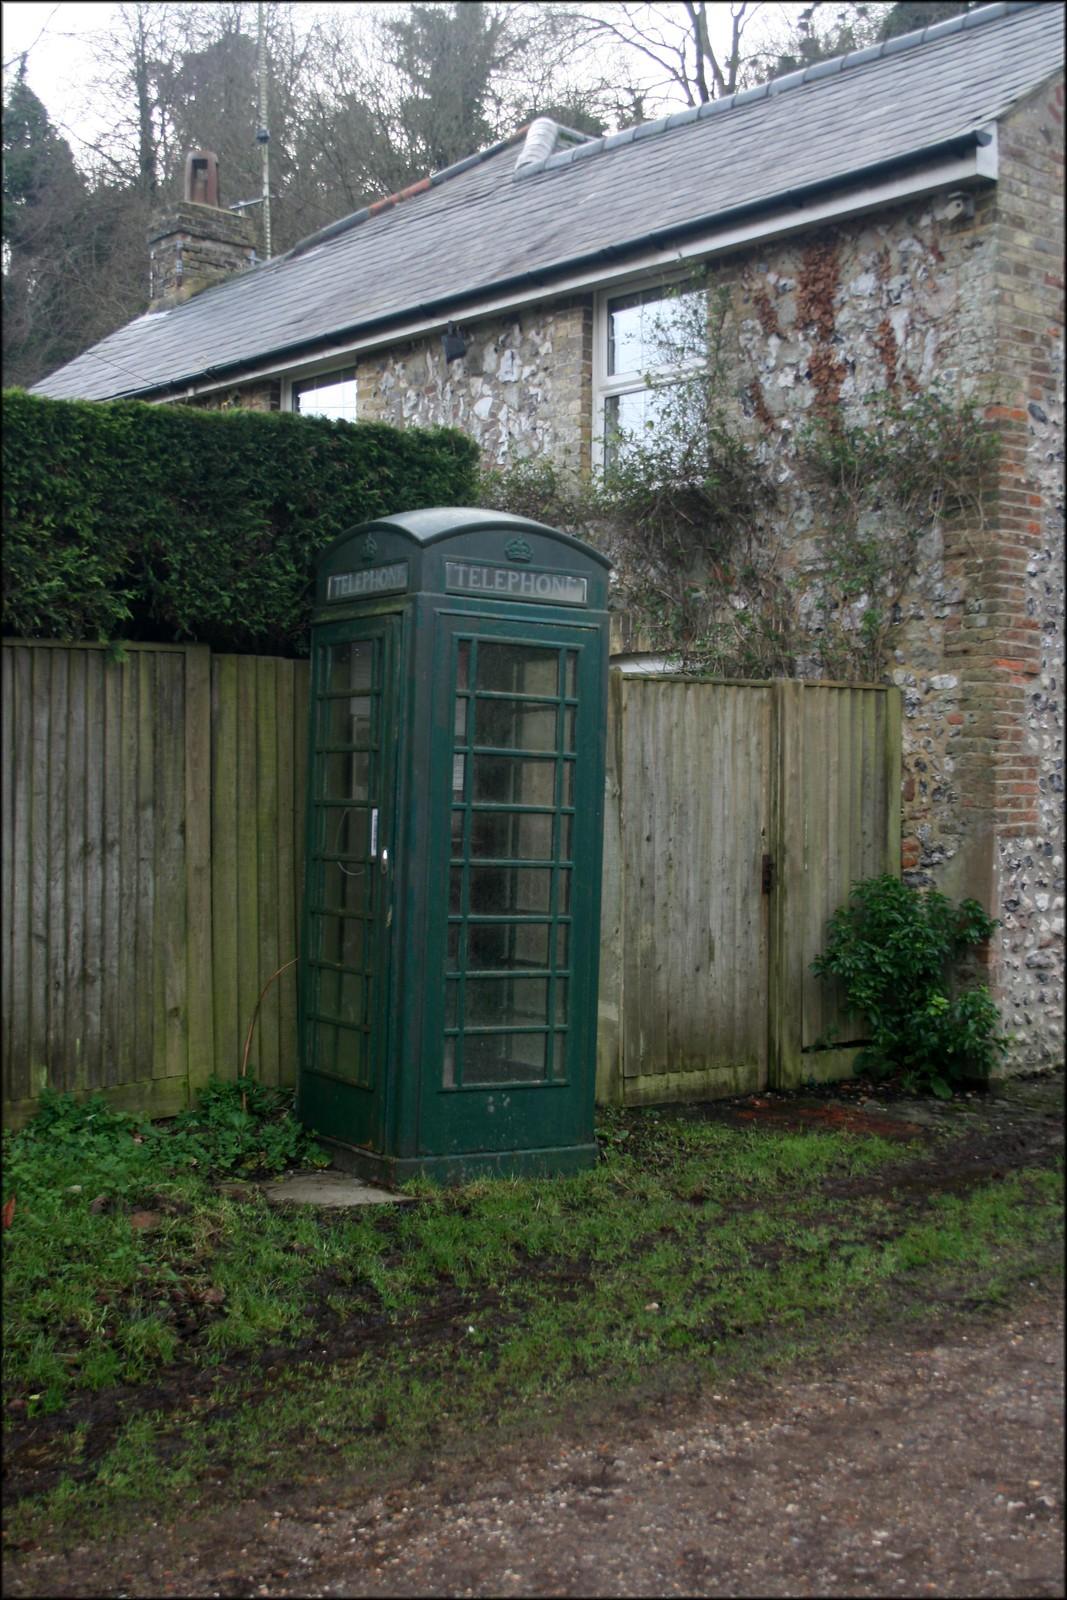 Friston Forest near Litlington A green telephone box at the entrance to Friston Forest near Litlington